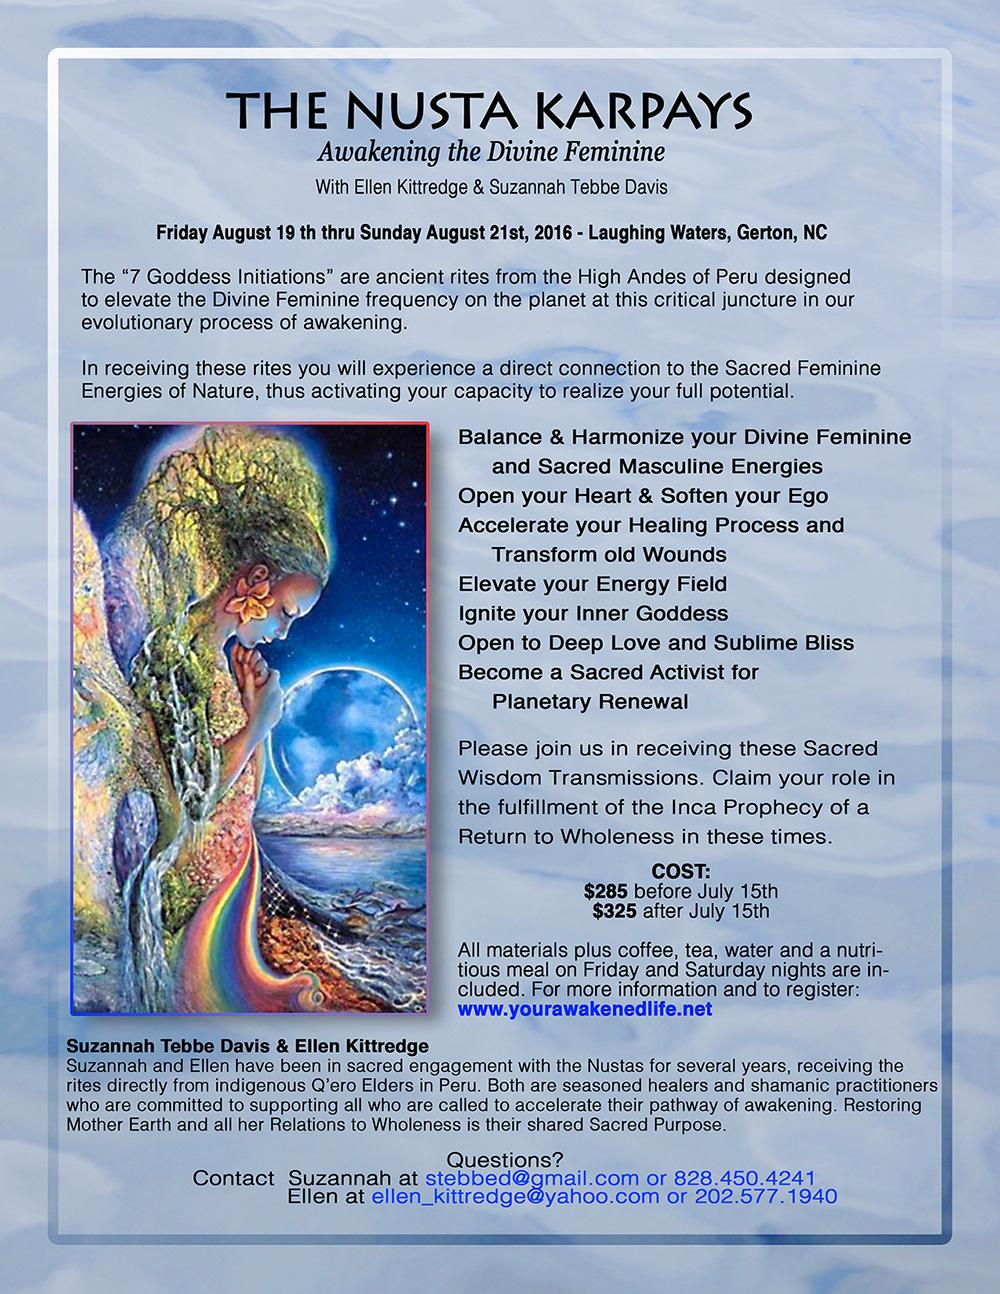 Nusta Karpay: Awakening and Healing the Divine Feminine with Ellen Kittredge and Suzannah Tebbe Davis